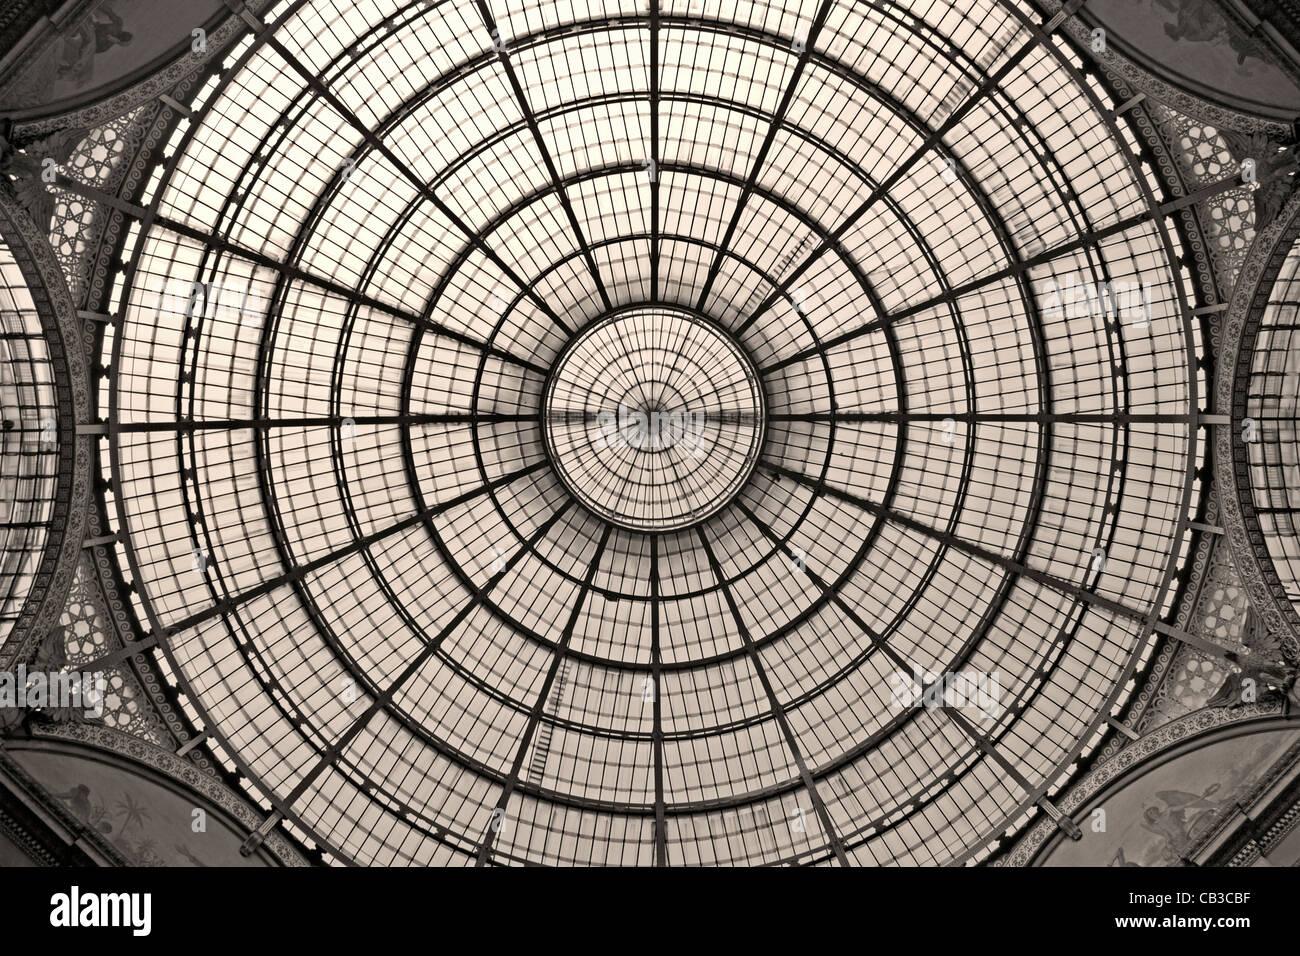 Milan - glass cupola of Vittorio Emanuele galleria - Stock Image